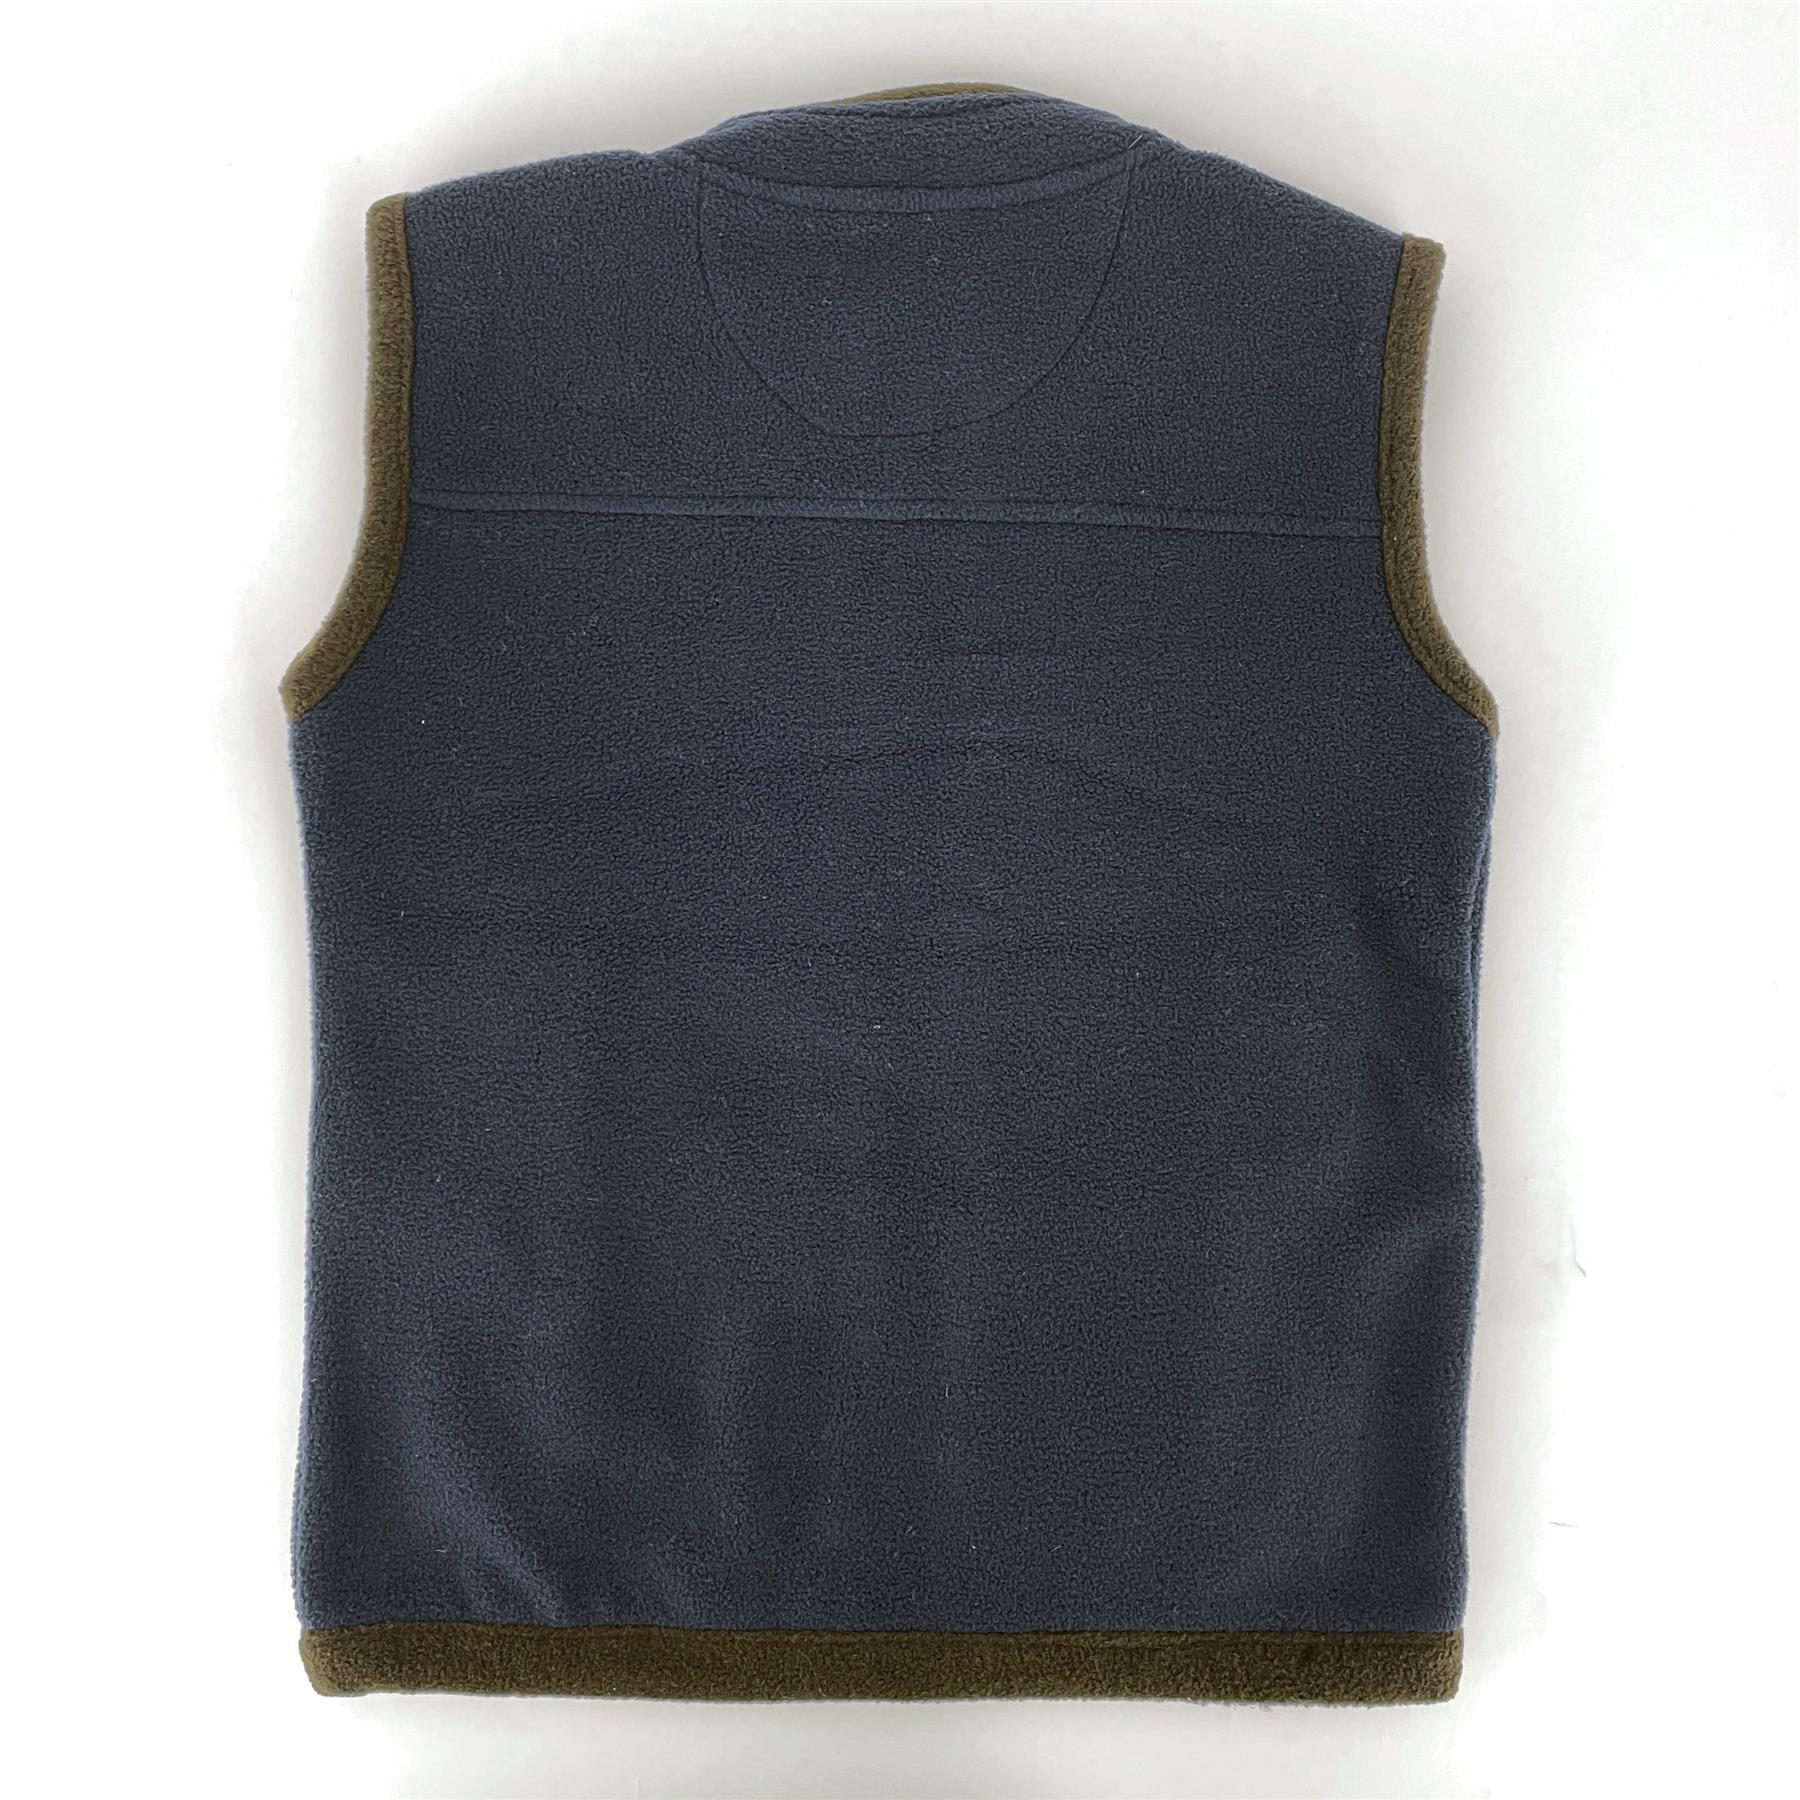 miniatuur 8 - Hazy Blue Kids Angus Pheasant Bodywarmer Boys Girls Gilet Vest Country Fleece